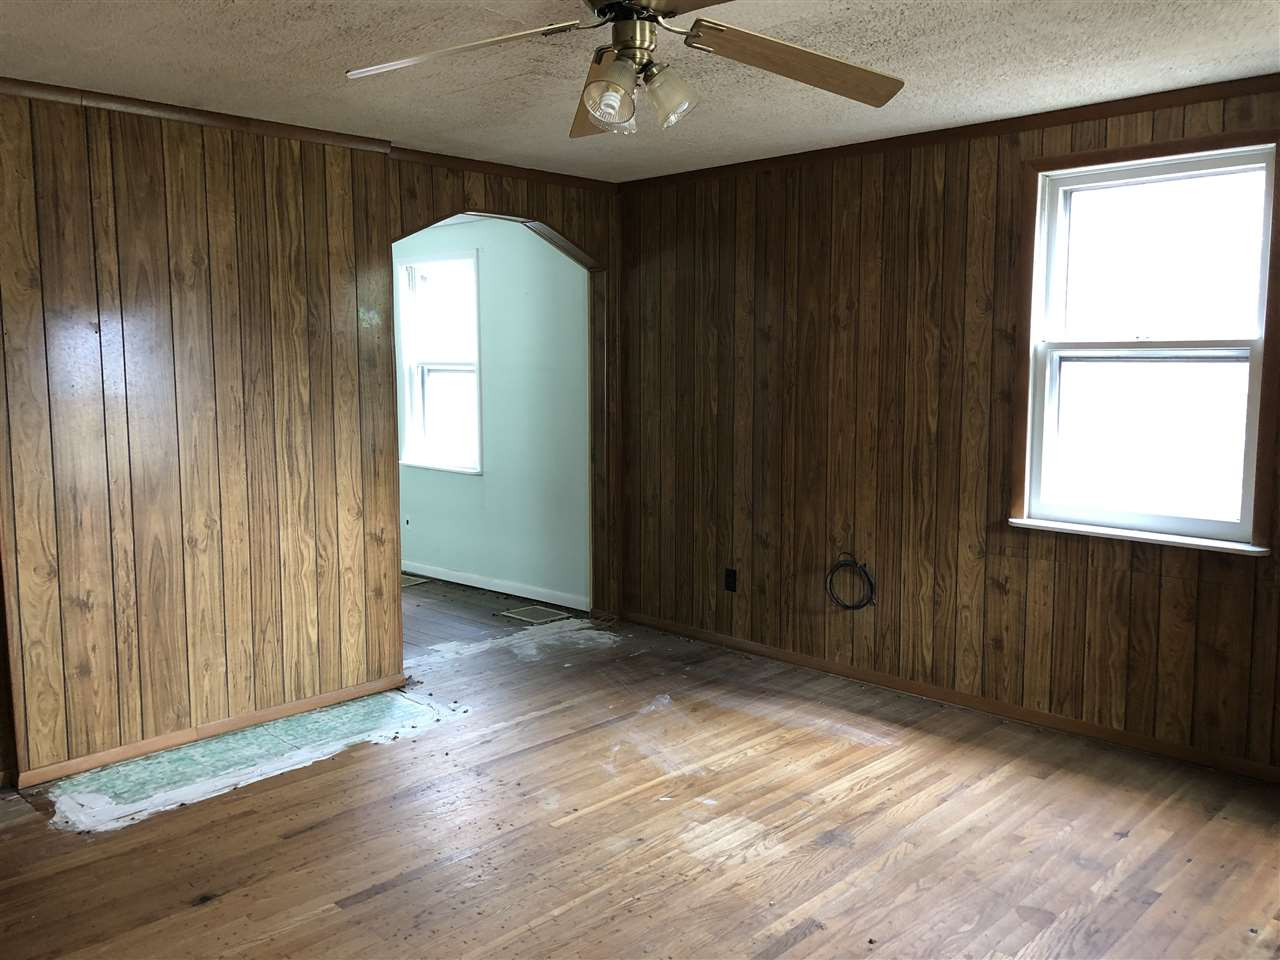 Photo 3 for 424 W 22nd St Covington, KY 41014